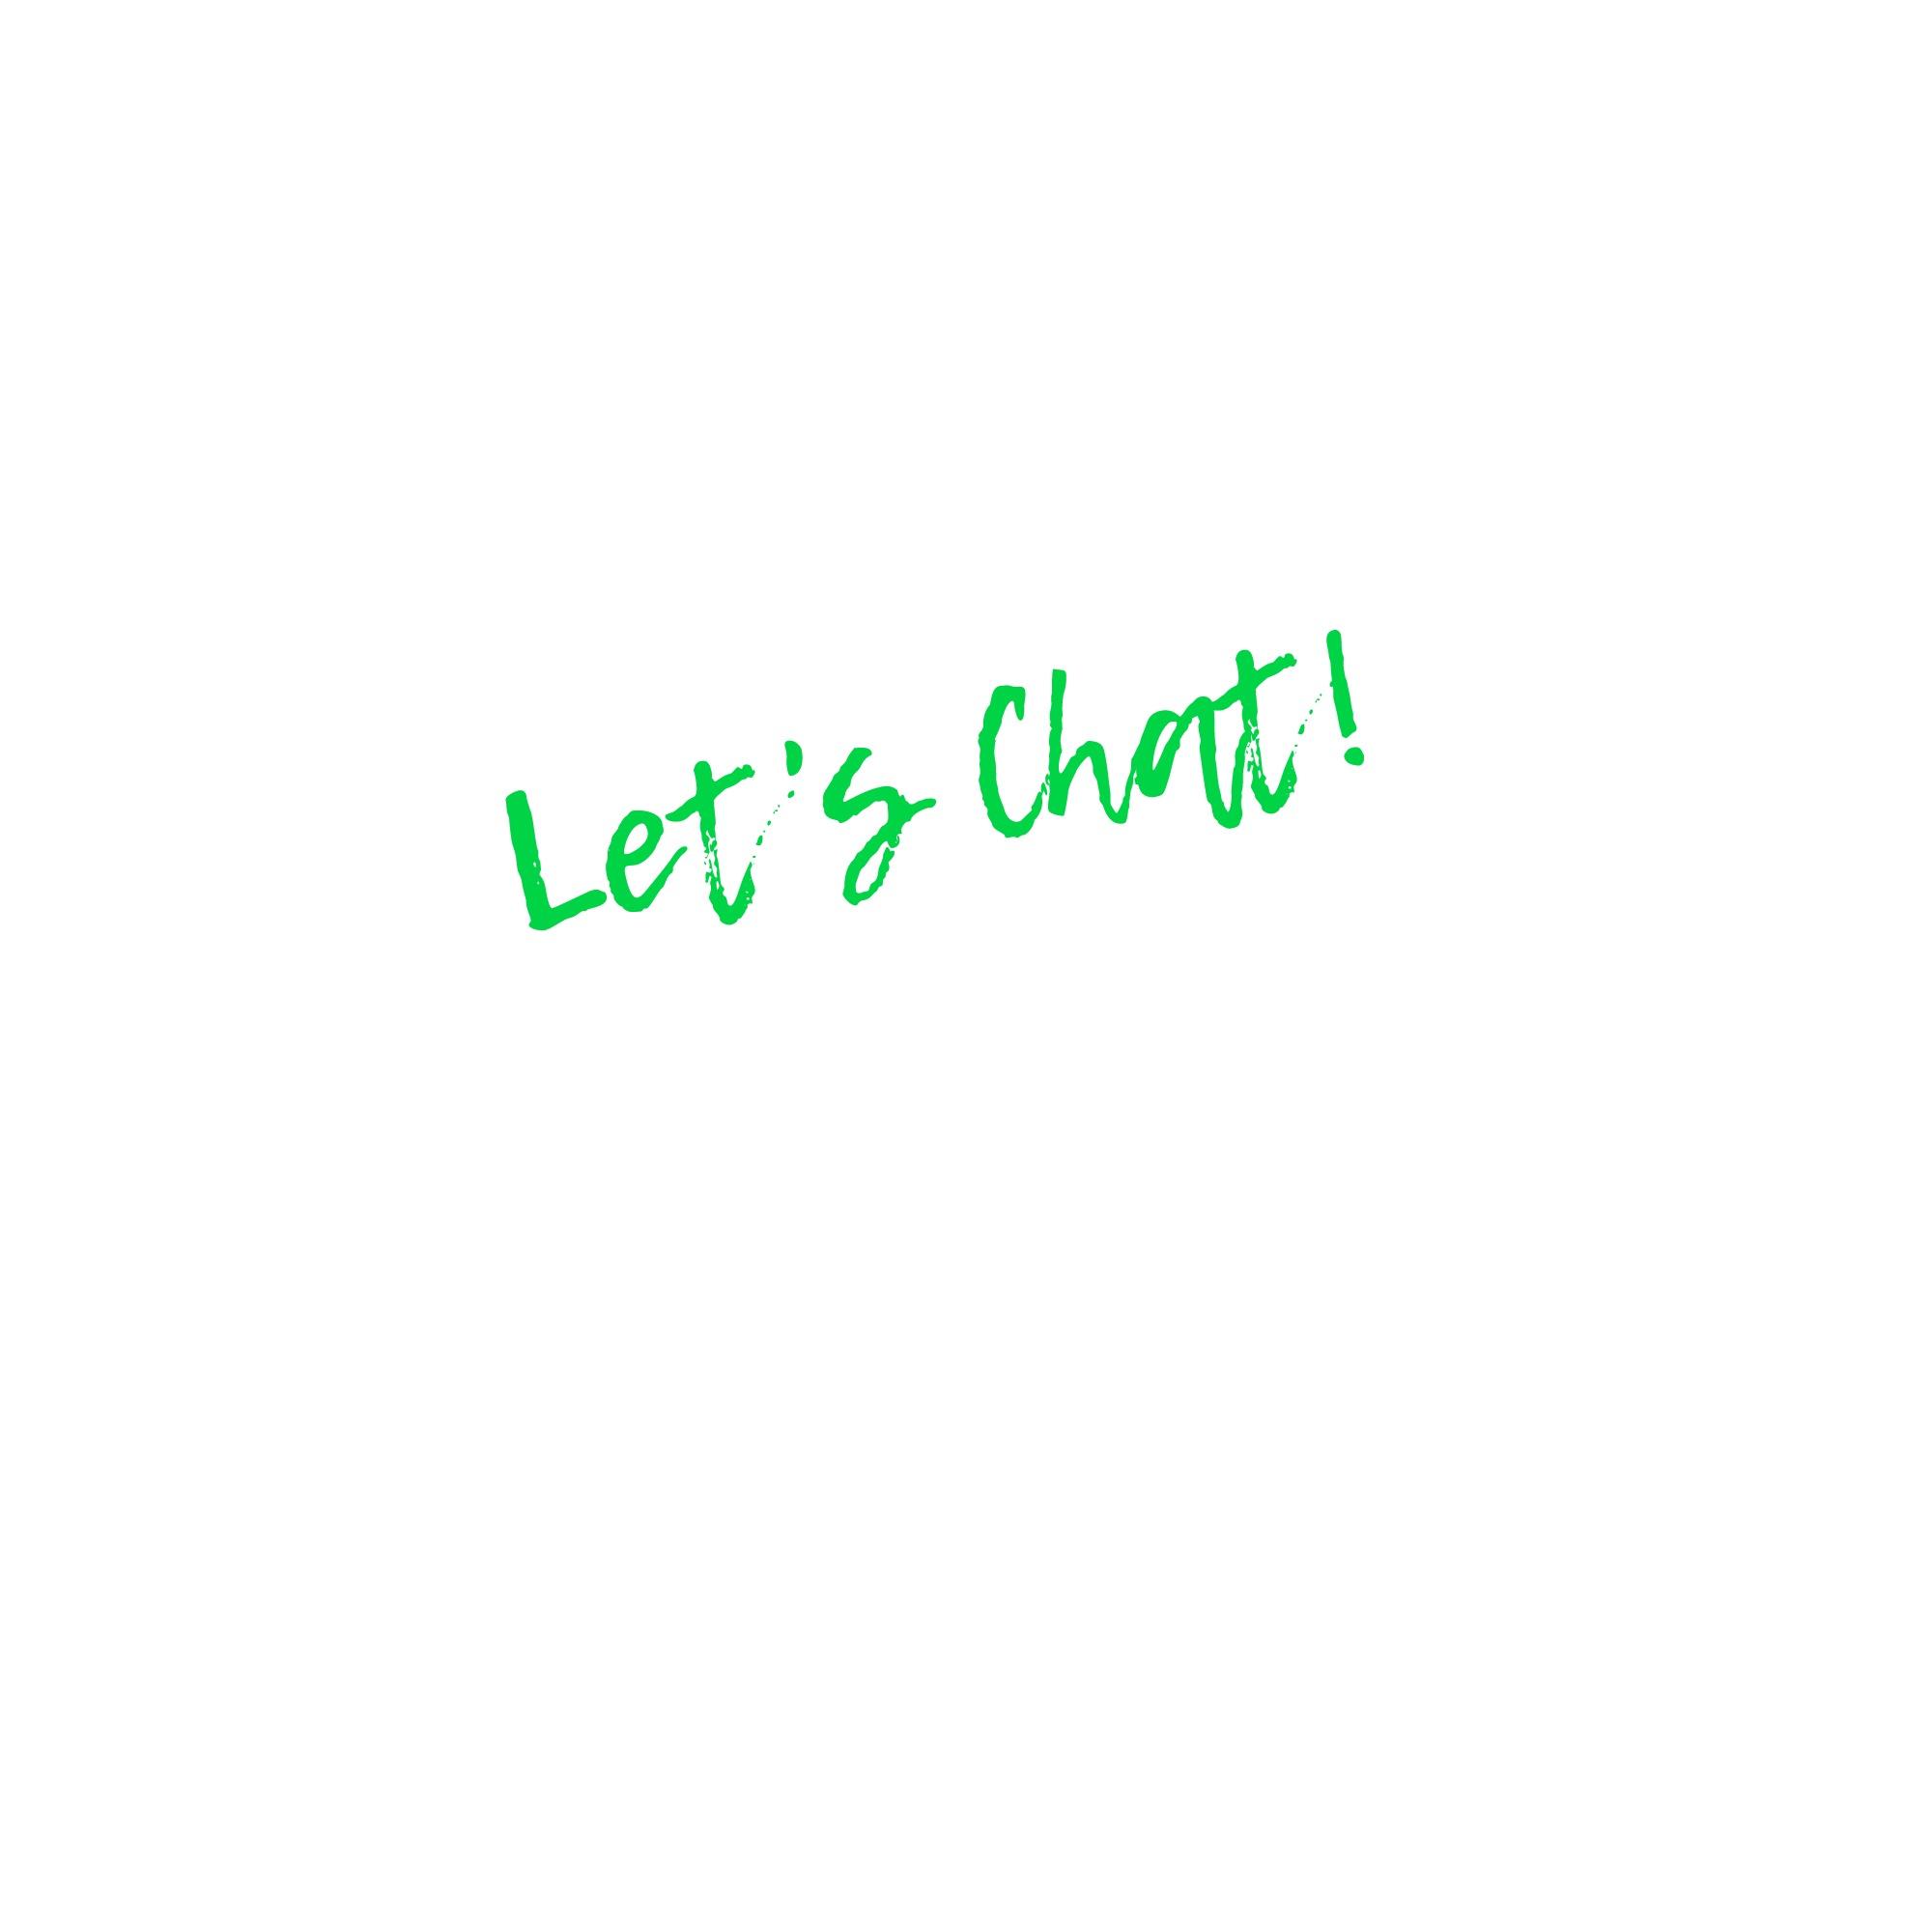 Lets chat!.jpg